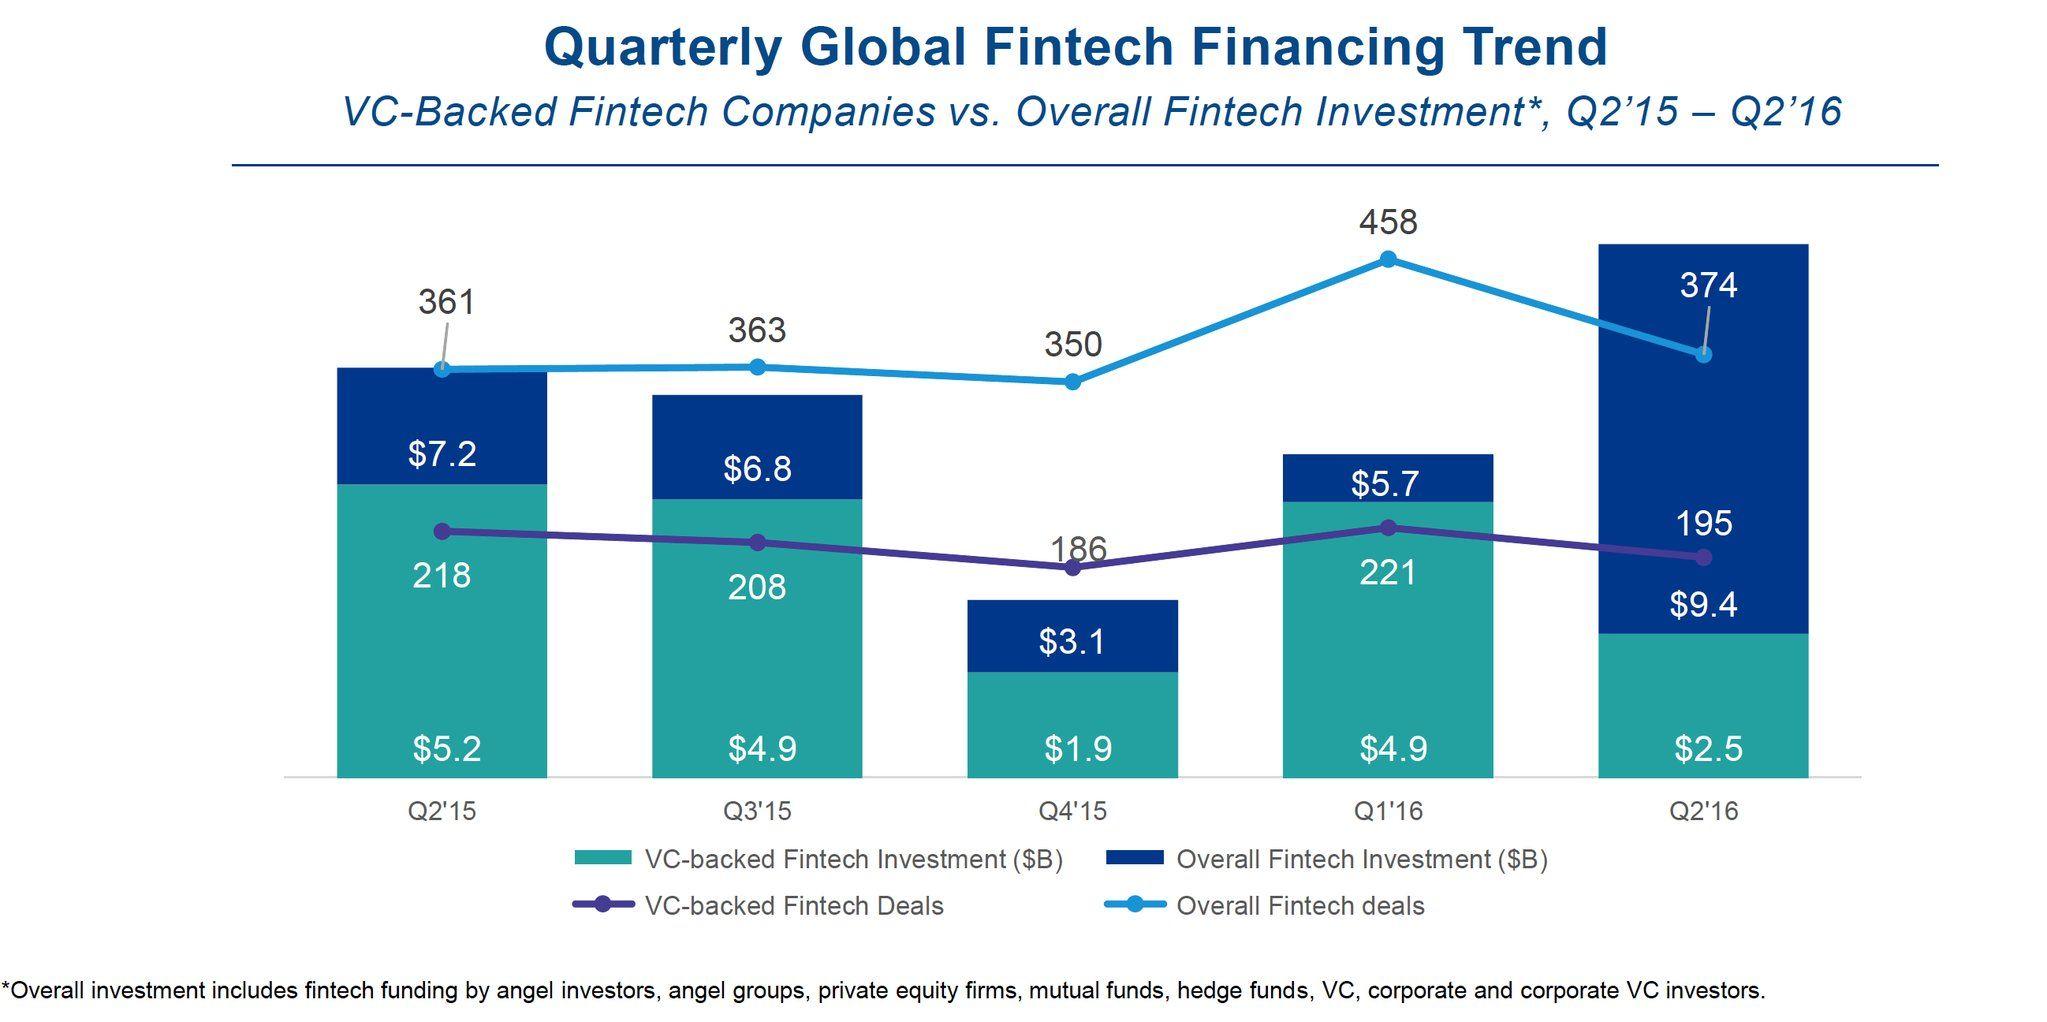 RT JimMarous: Q2 2016 #Fintech VC Funding Down  $4.5B AlibabaGroup Impacts Growth https://t.co/UlphWRTHMg  CBins https://t.co/Xtuch6Jwf6